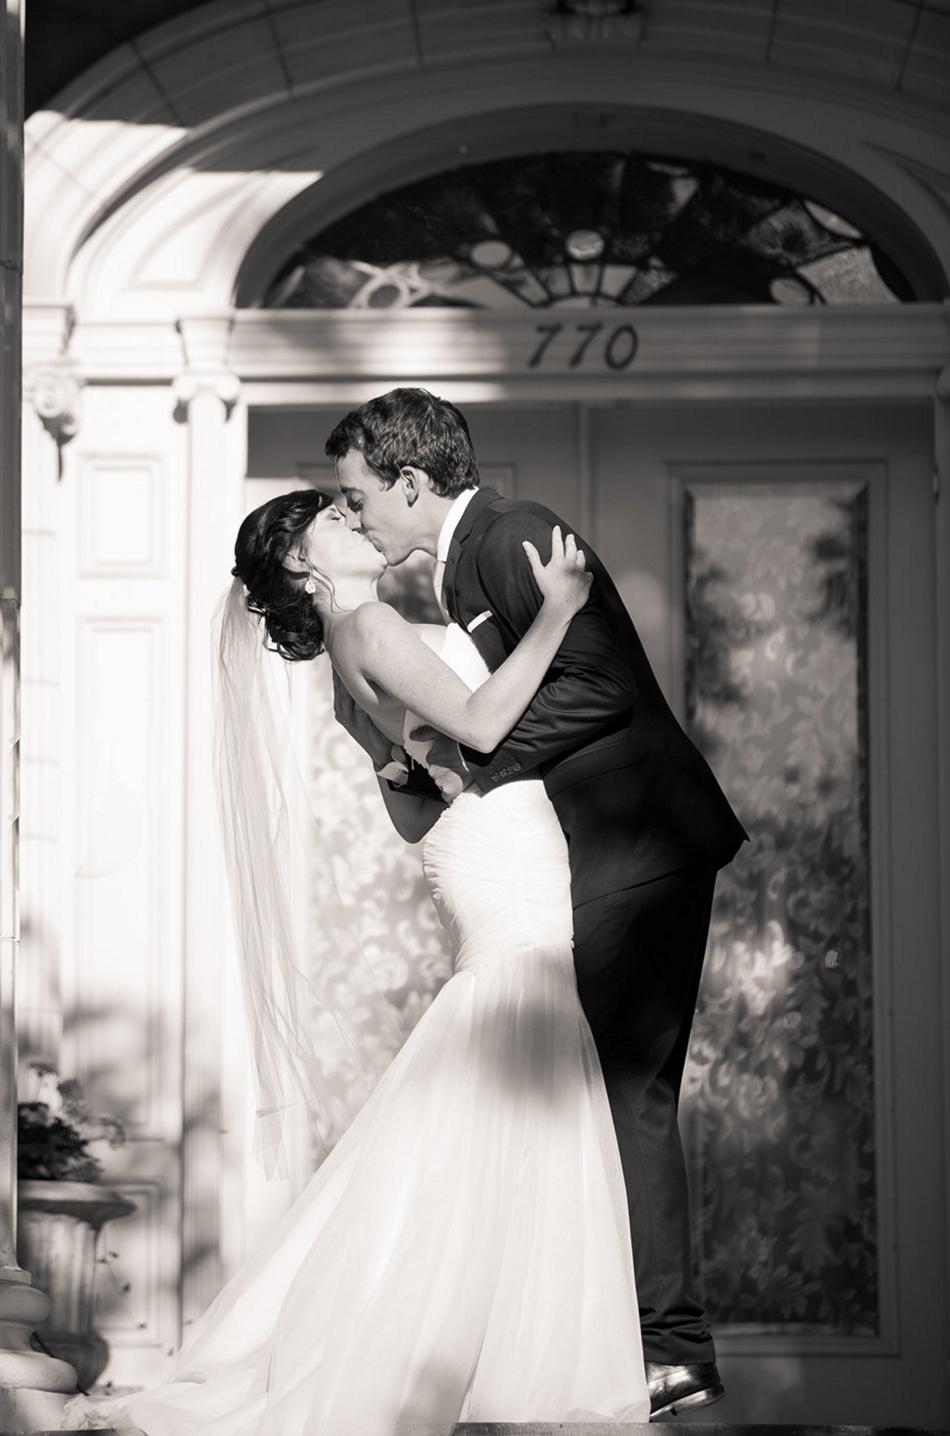 monique_lhuillier_denver_wedding16.jpg